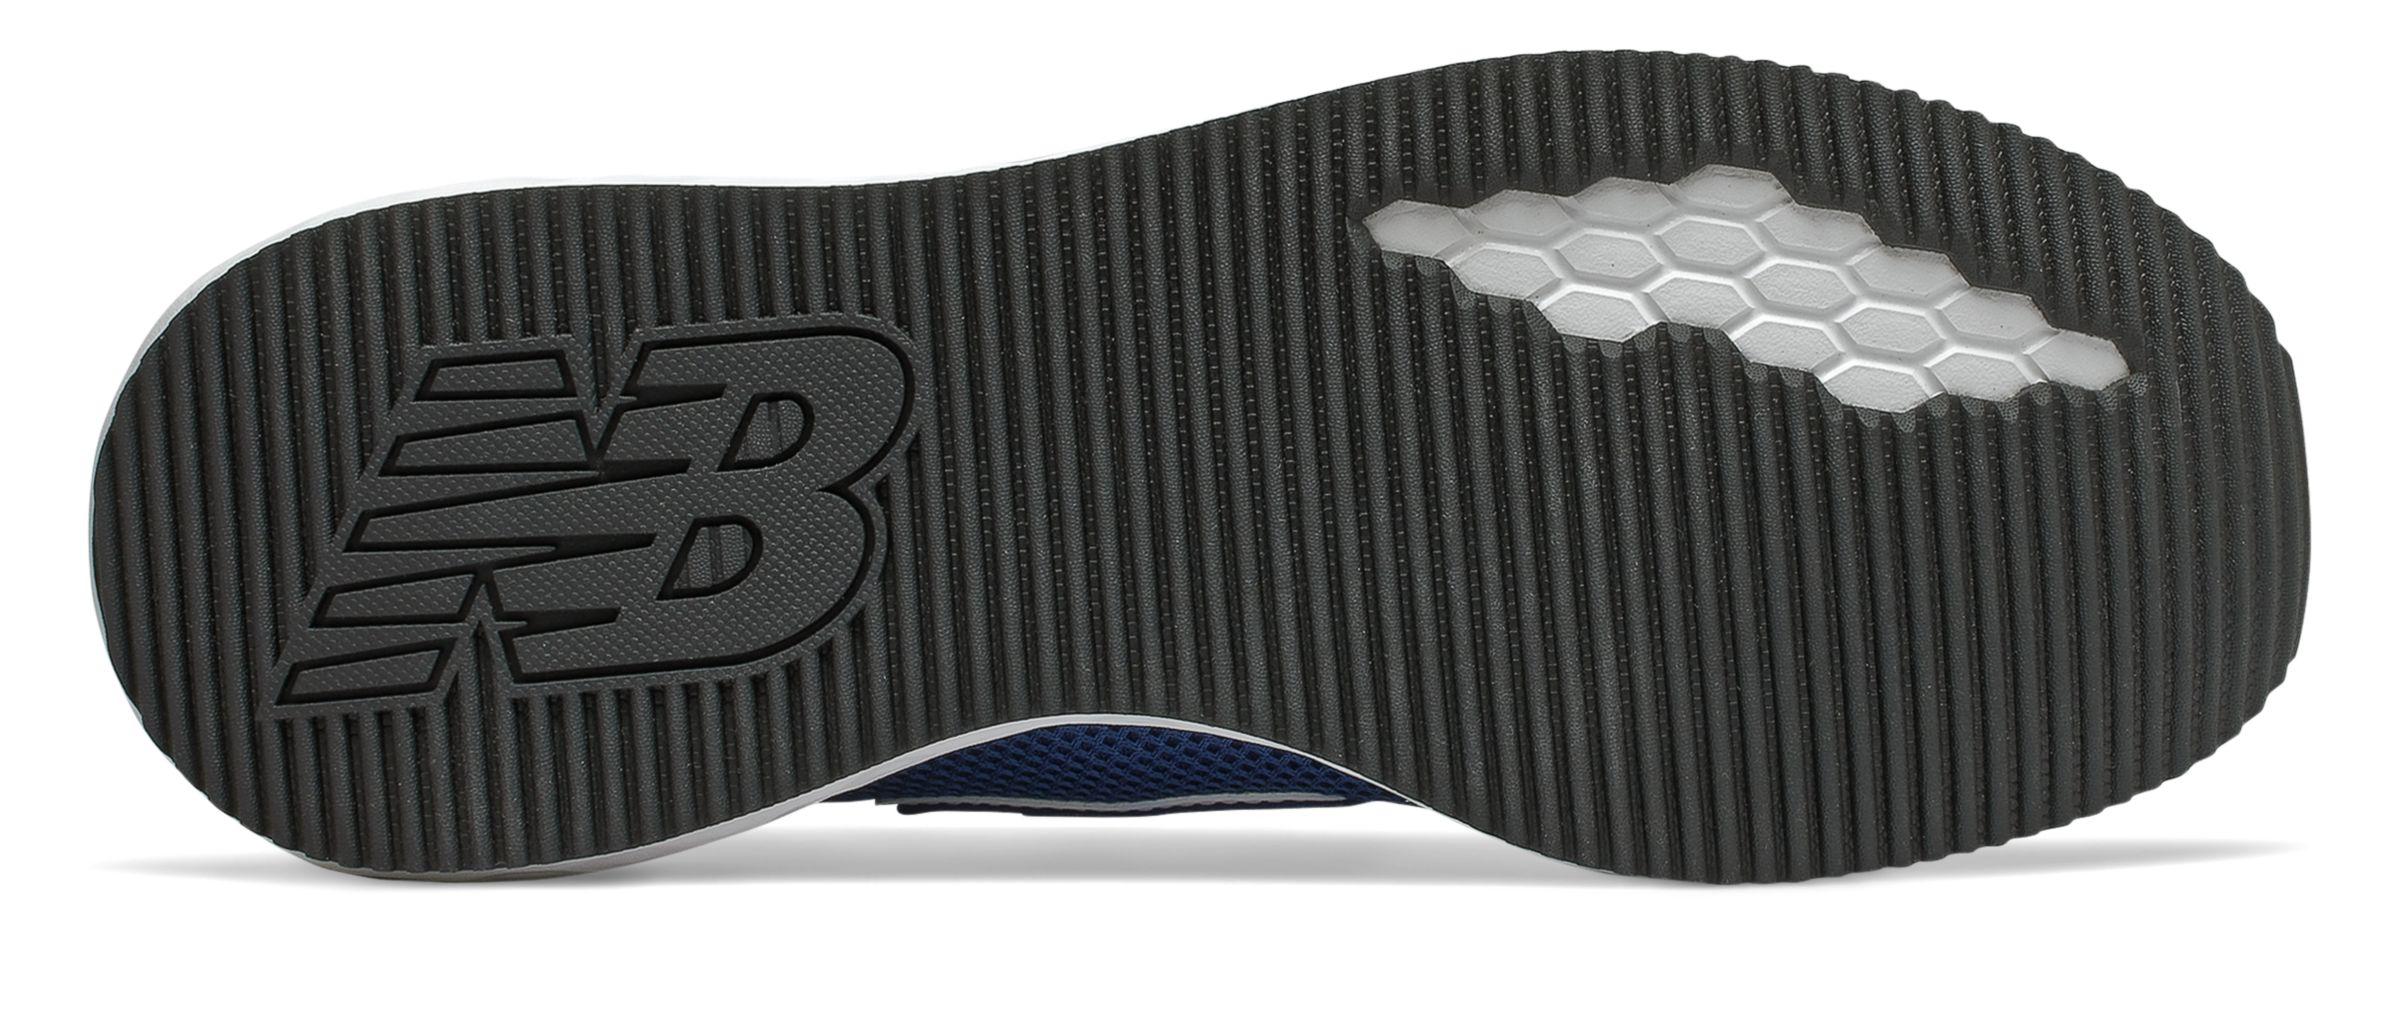 New Balance X70